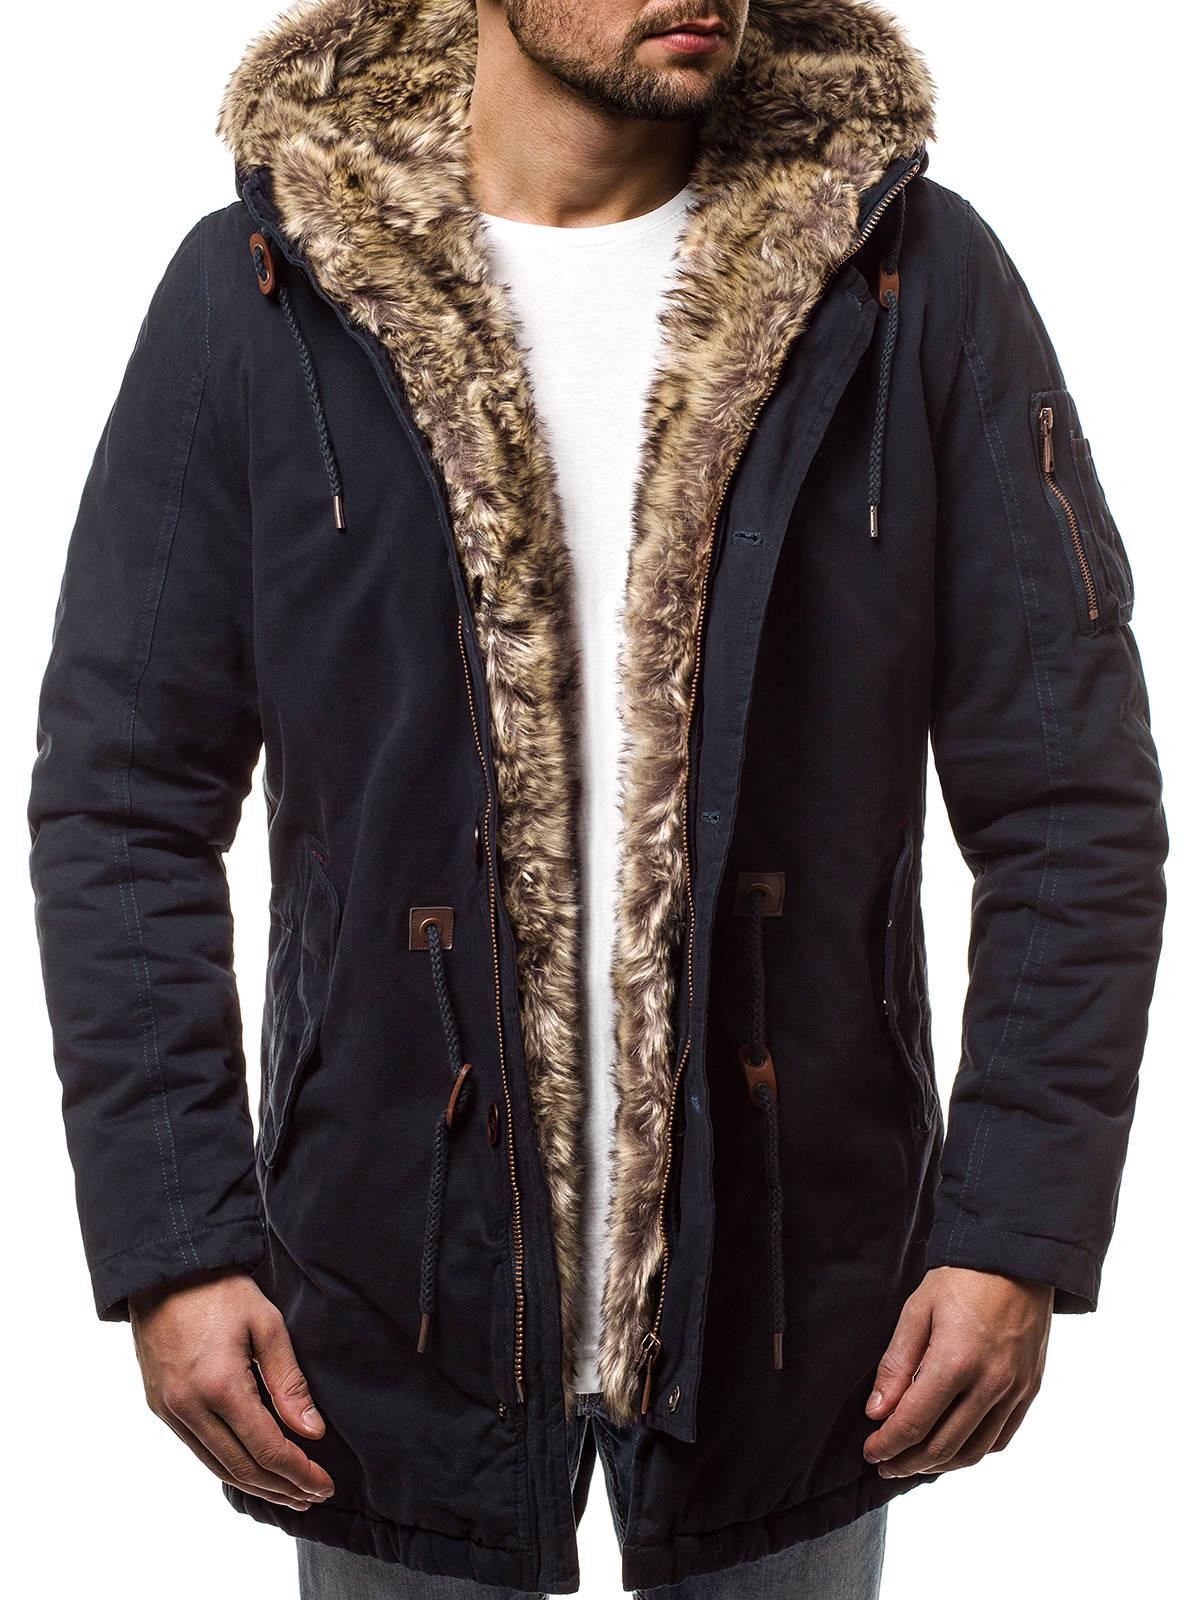 Jb Wintercoat Manteau 1065 Chaud Homme Veste Ozonee Parka D'hiver 0TdqaPw04S